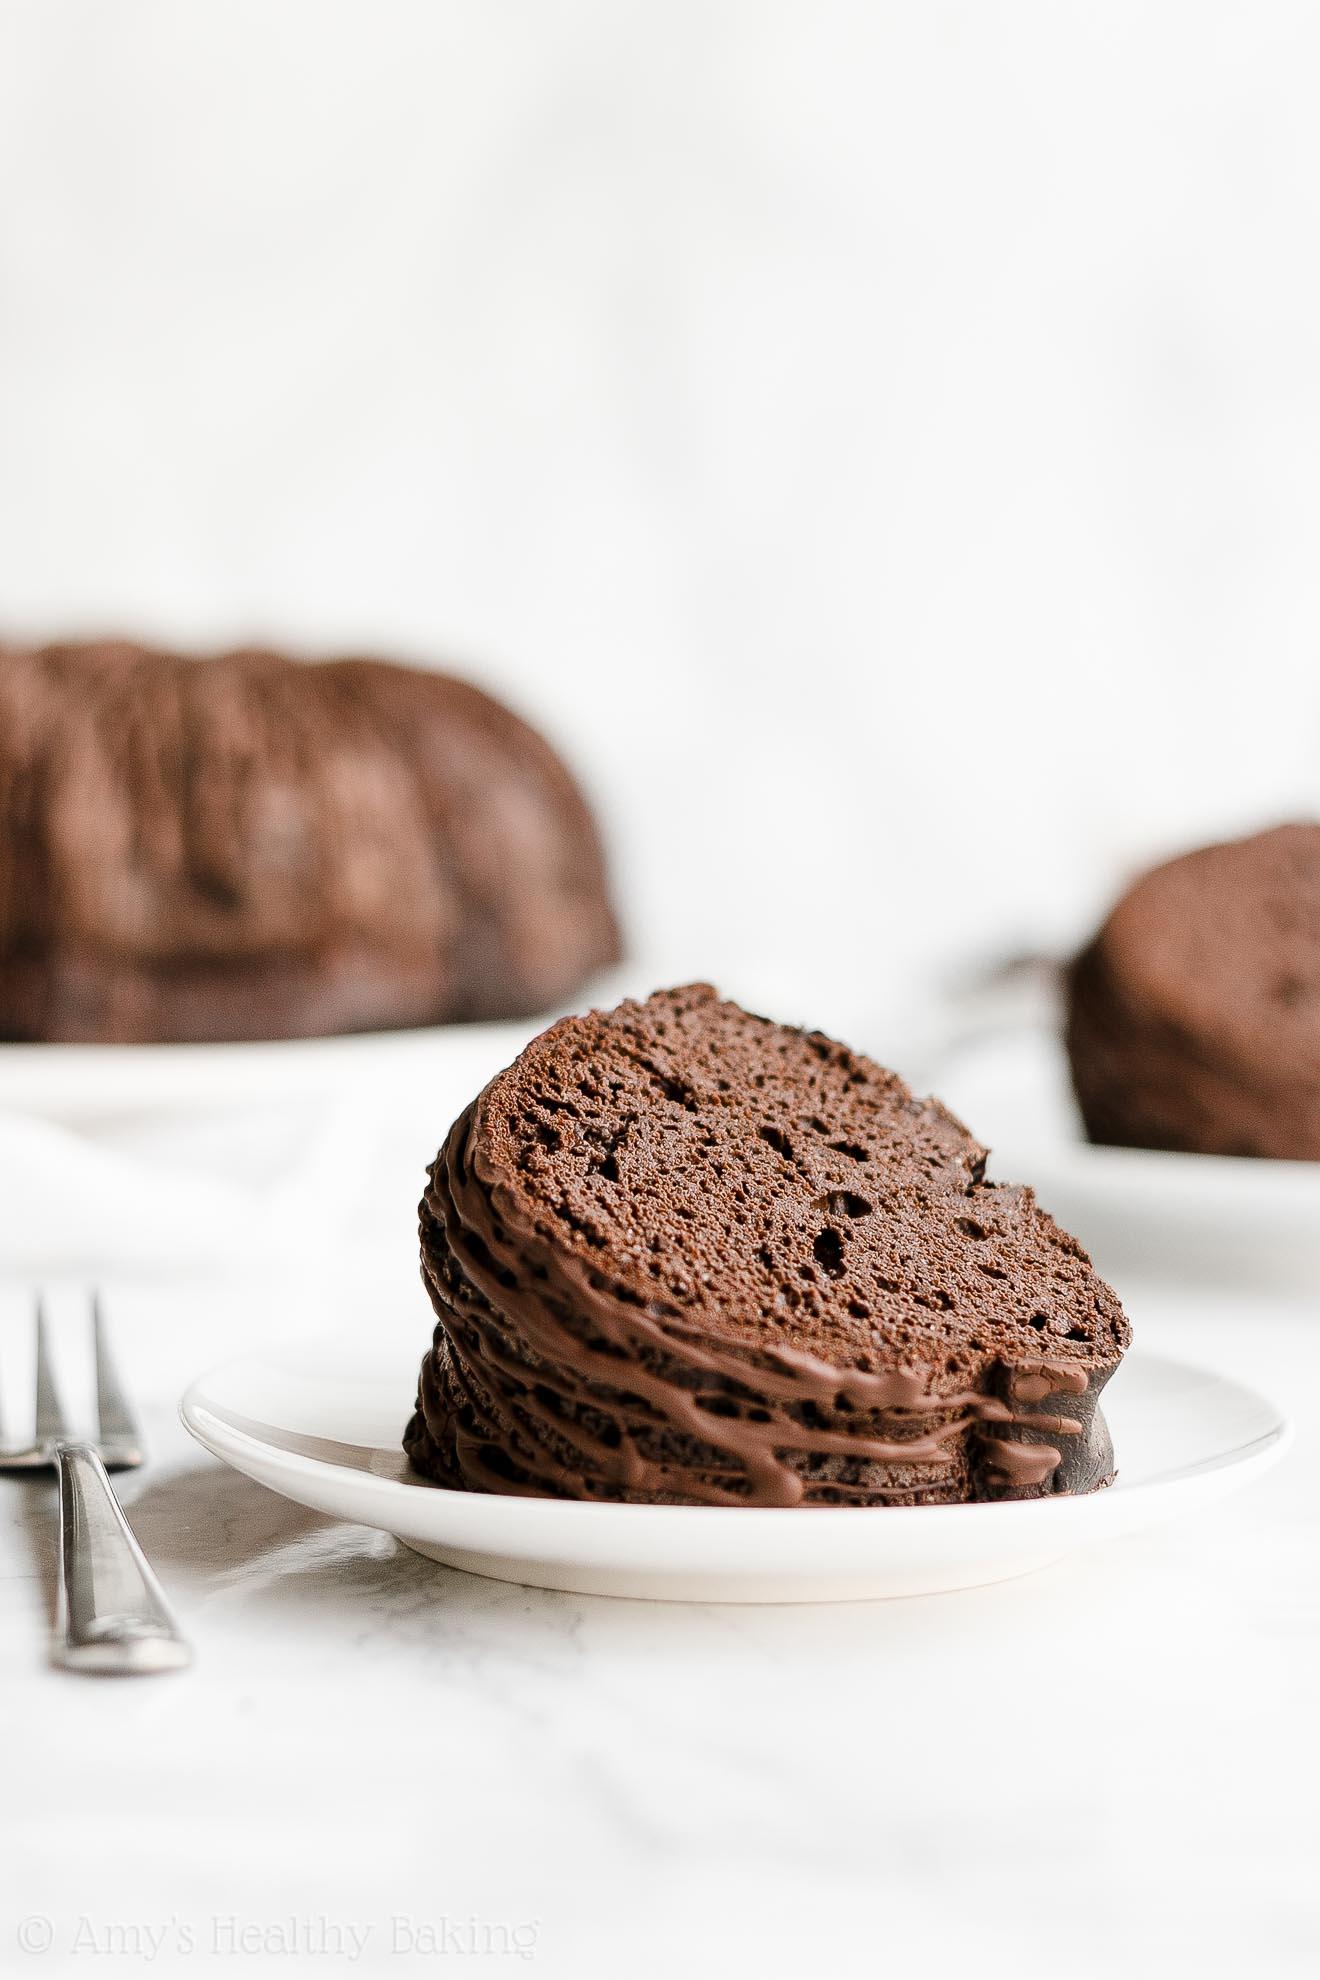 ULTIMATE Best Ever Healthy Low Sugar Low Fat Chocolate Fudge Bundt Cake